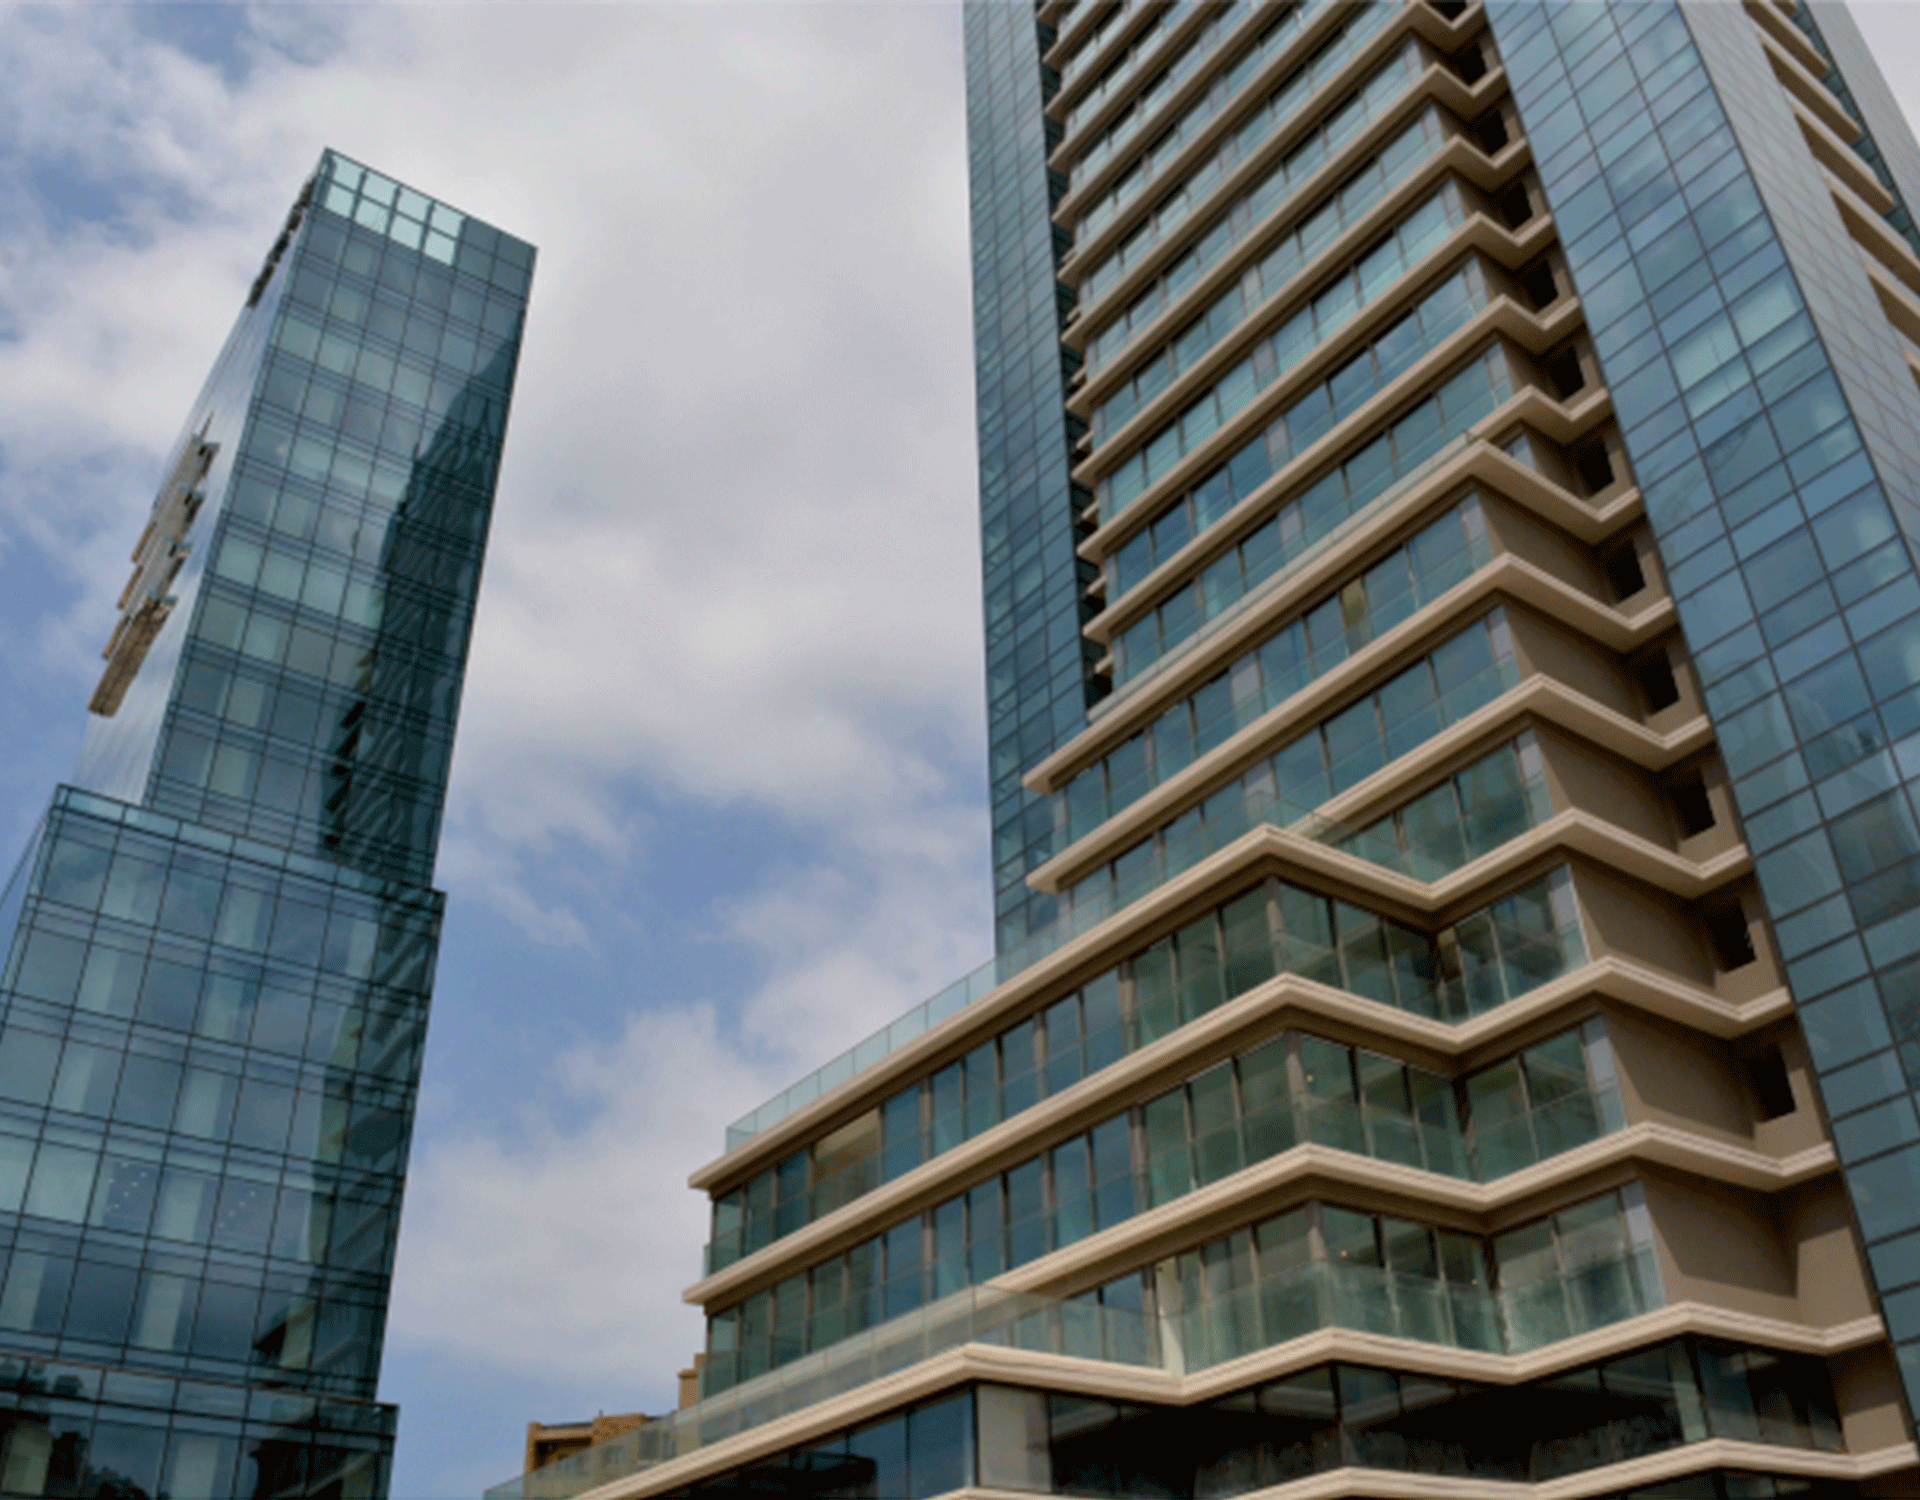 CRYSTAL TOWERS ANTELIAS JAL EL DIB LEBANON